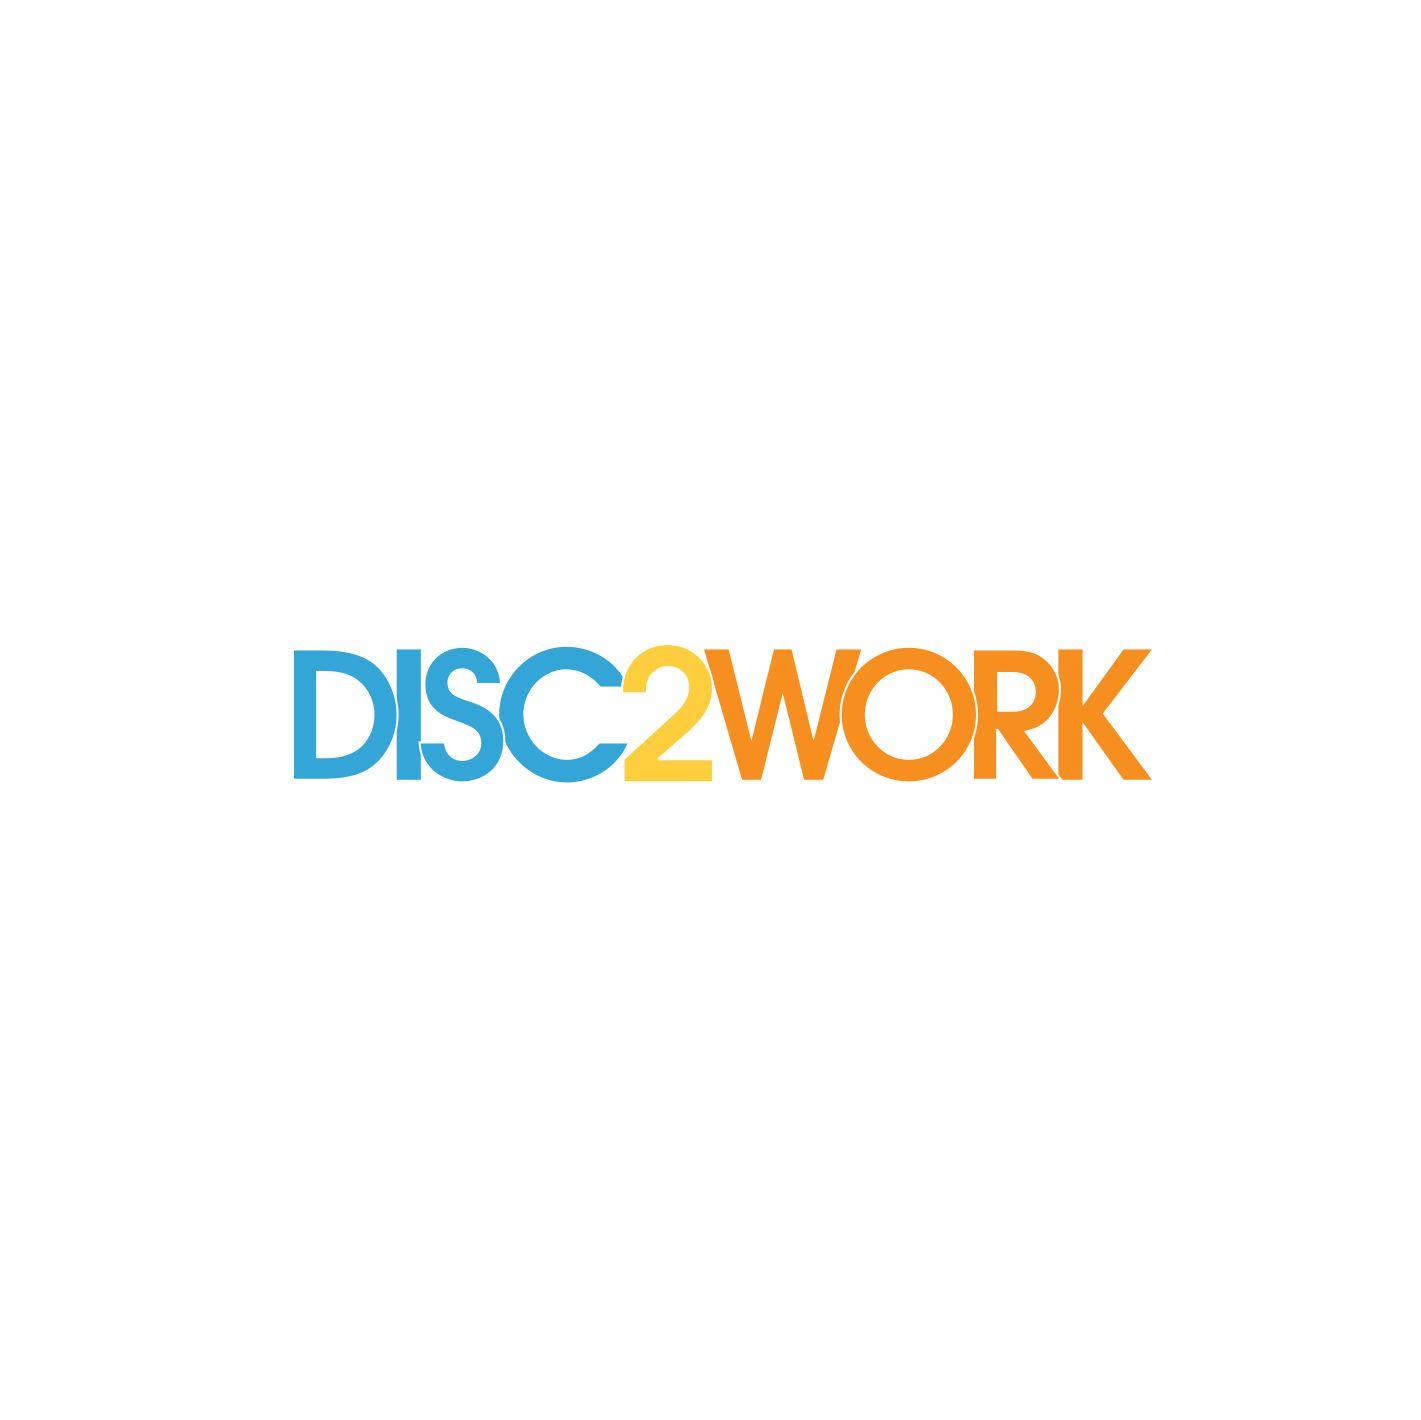 303 Bold Modern Training Logo Designs For Disc2work A